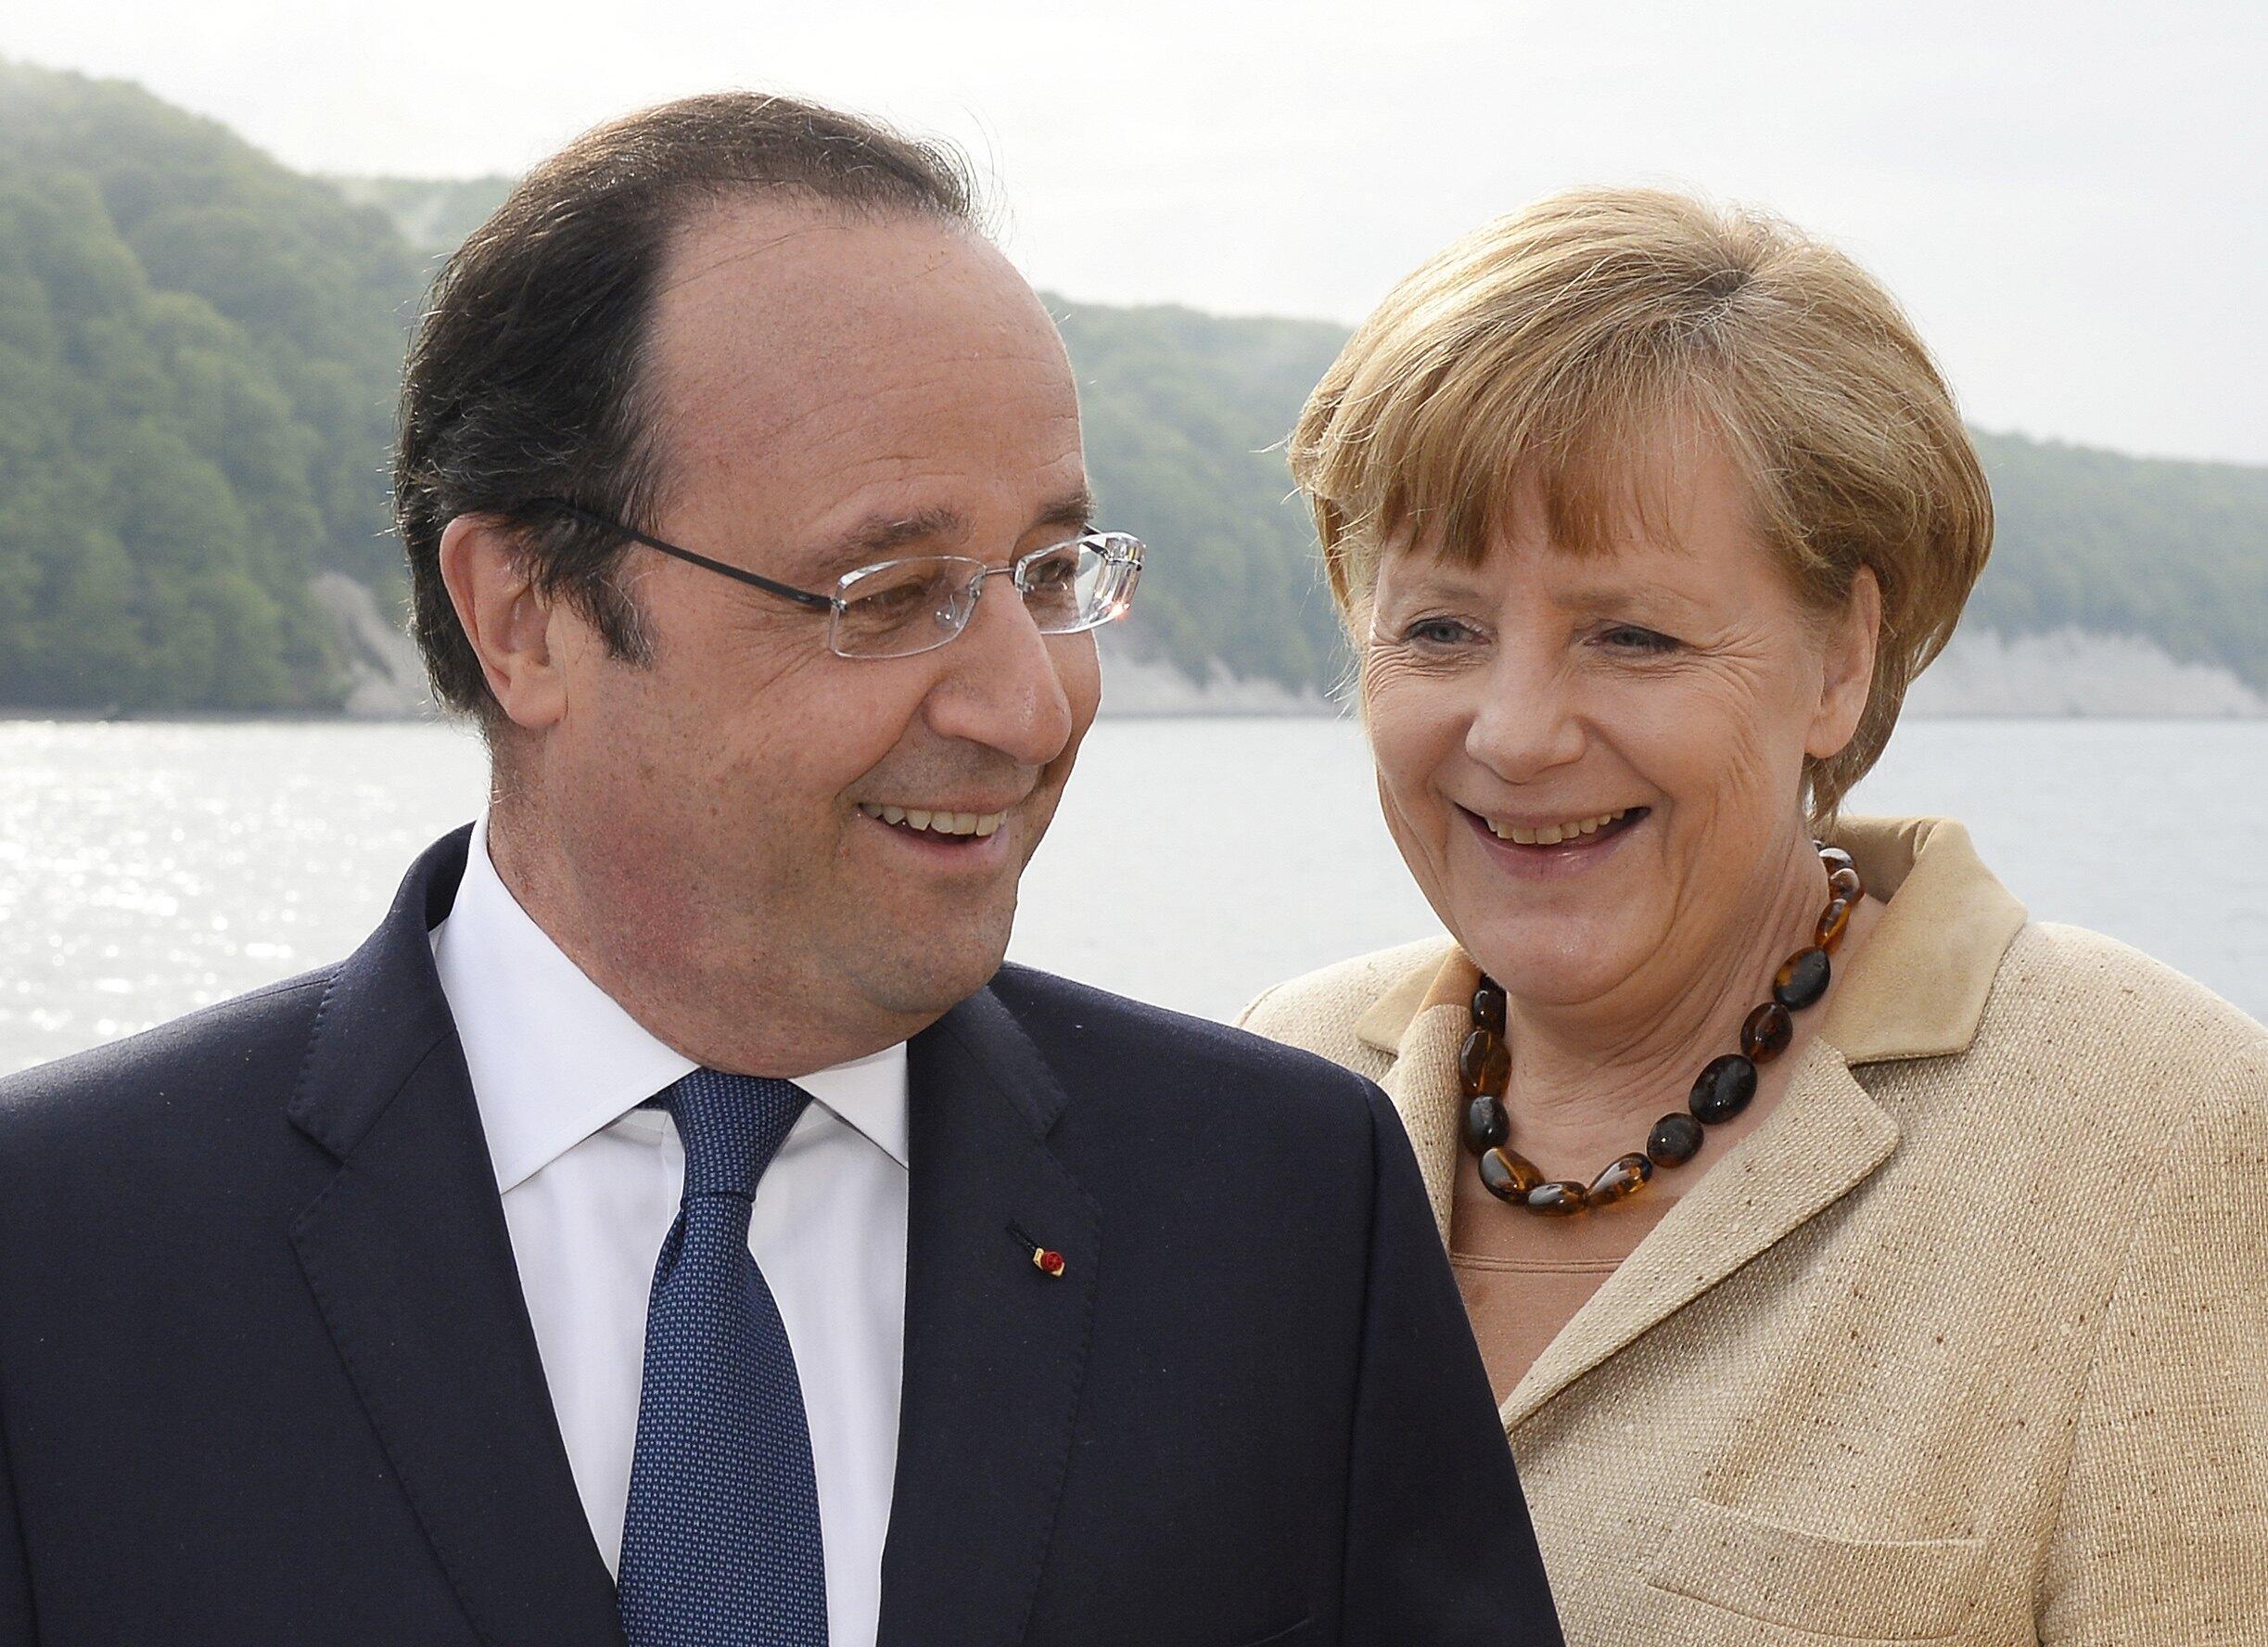 François Hollande e Angela Merkel a bordo do «MS Nordwind», no mar Báltico, 9/5/14.